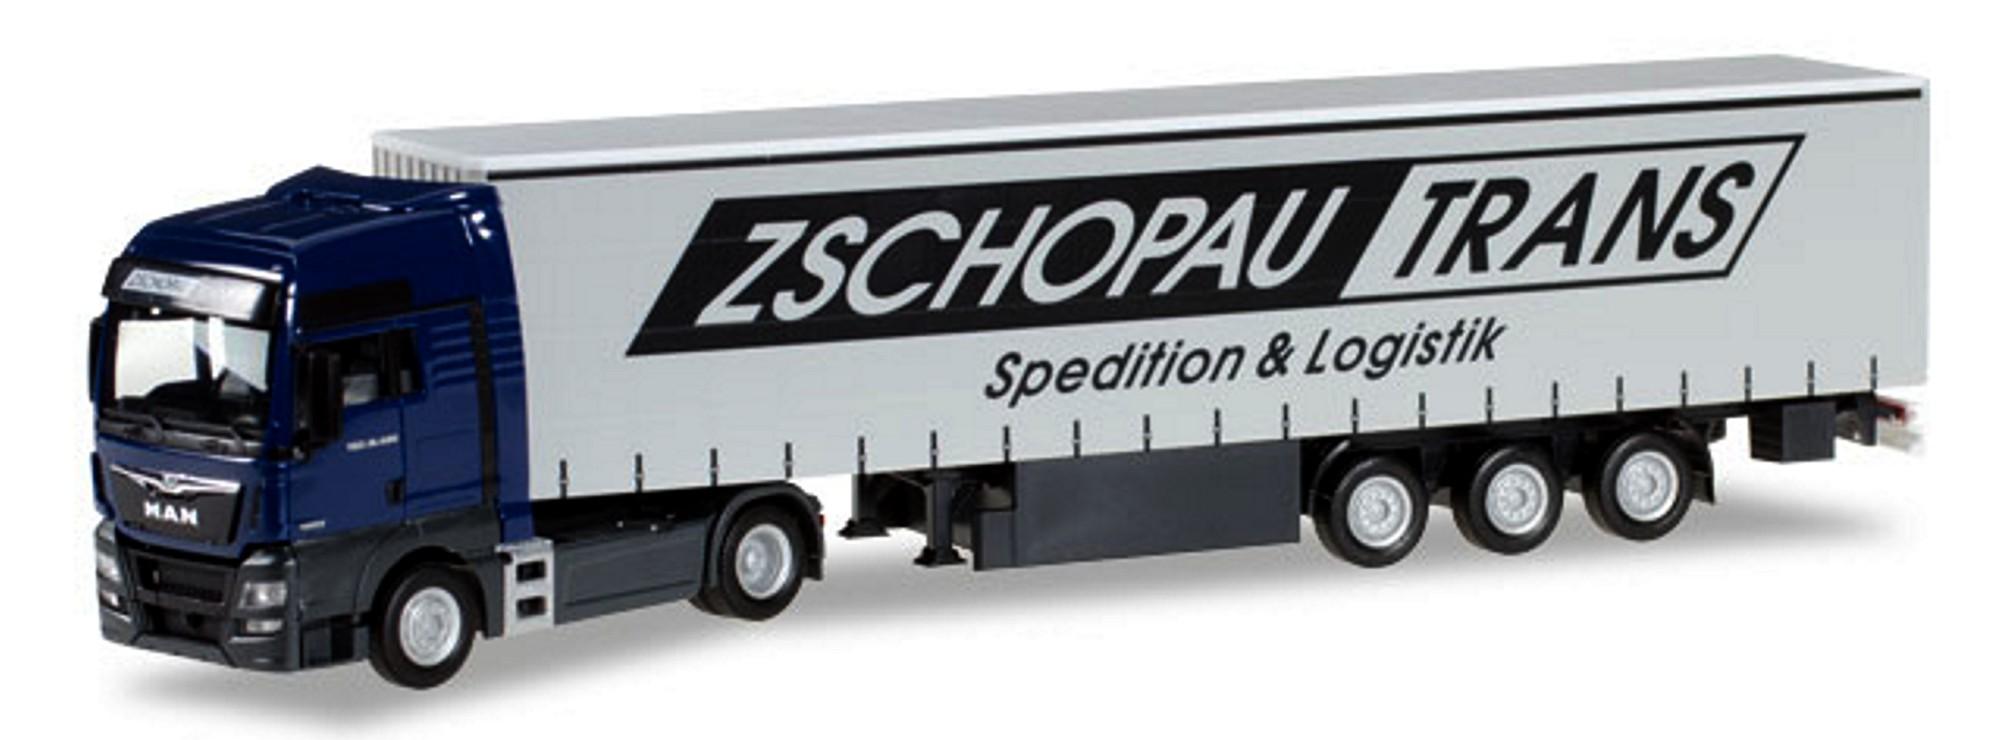 MAN TGX XXL Gardinenplanen-Sattelzug Zschopau Trans Herpa 1:87 922838 Spielzeugautos